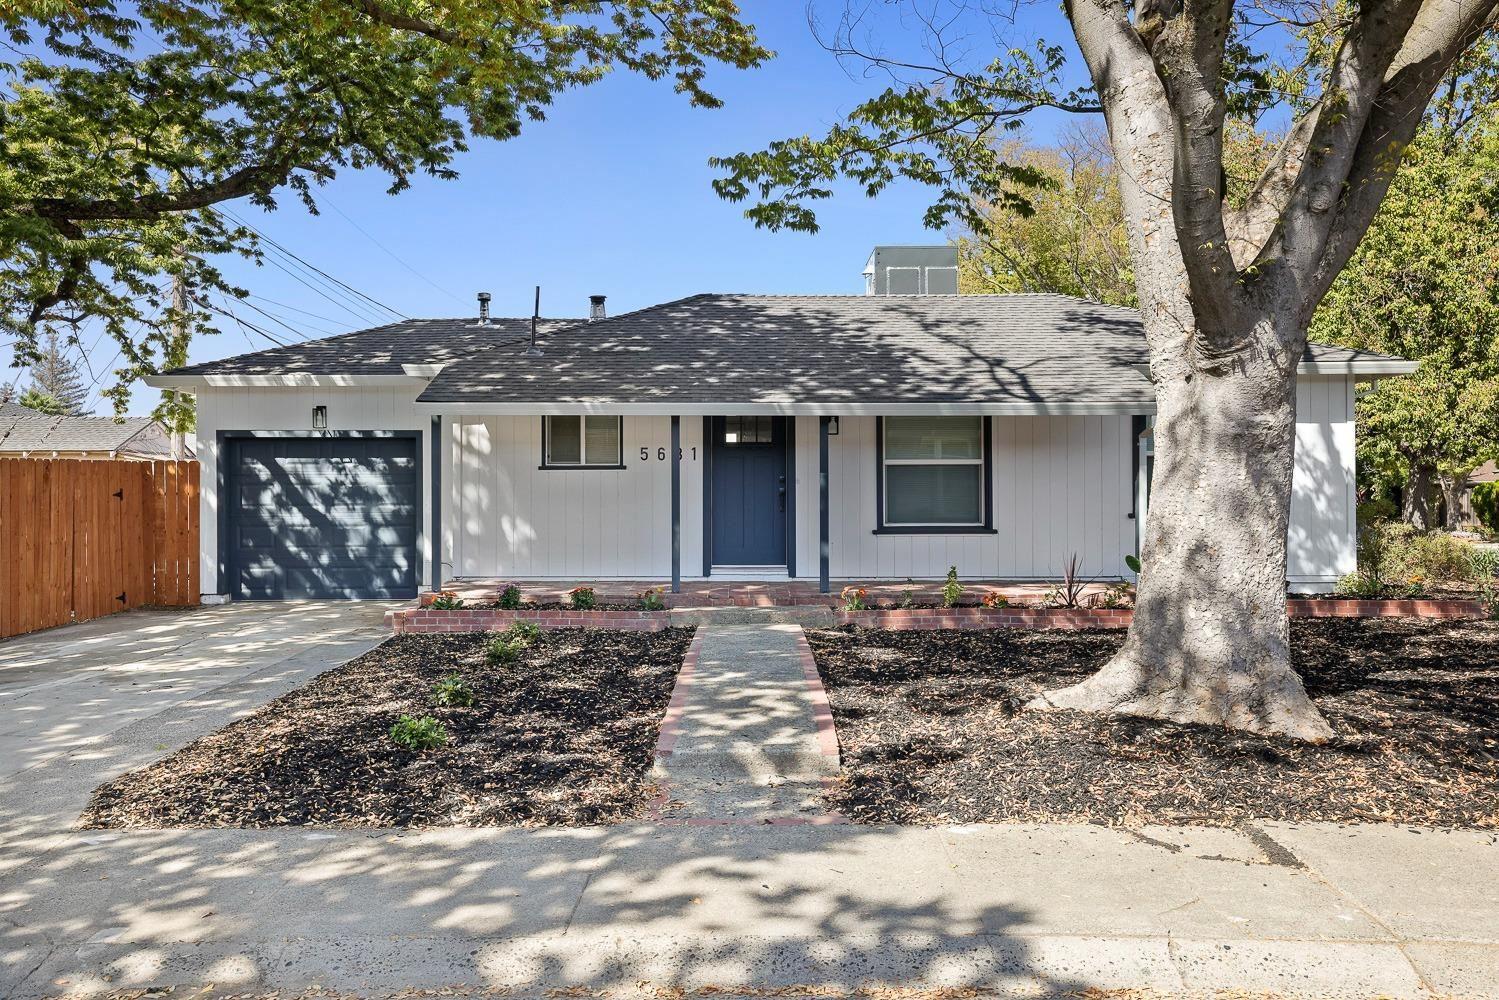 5681 13th Avenue, Sacramento, CA 95820 - MLS#: 221121577